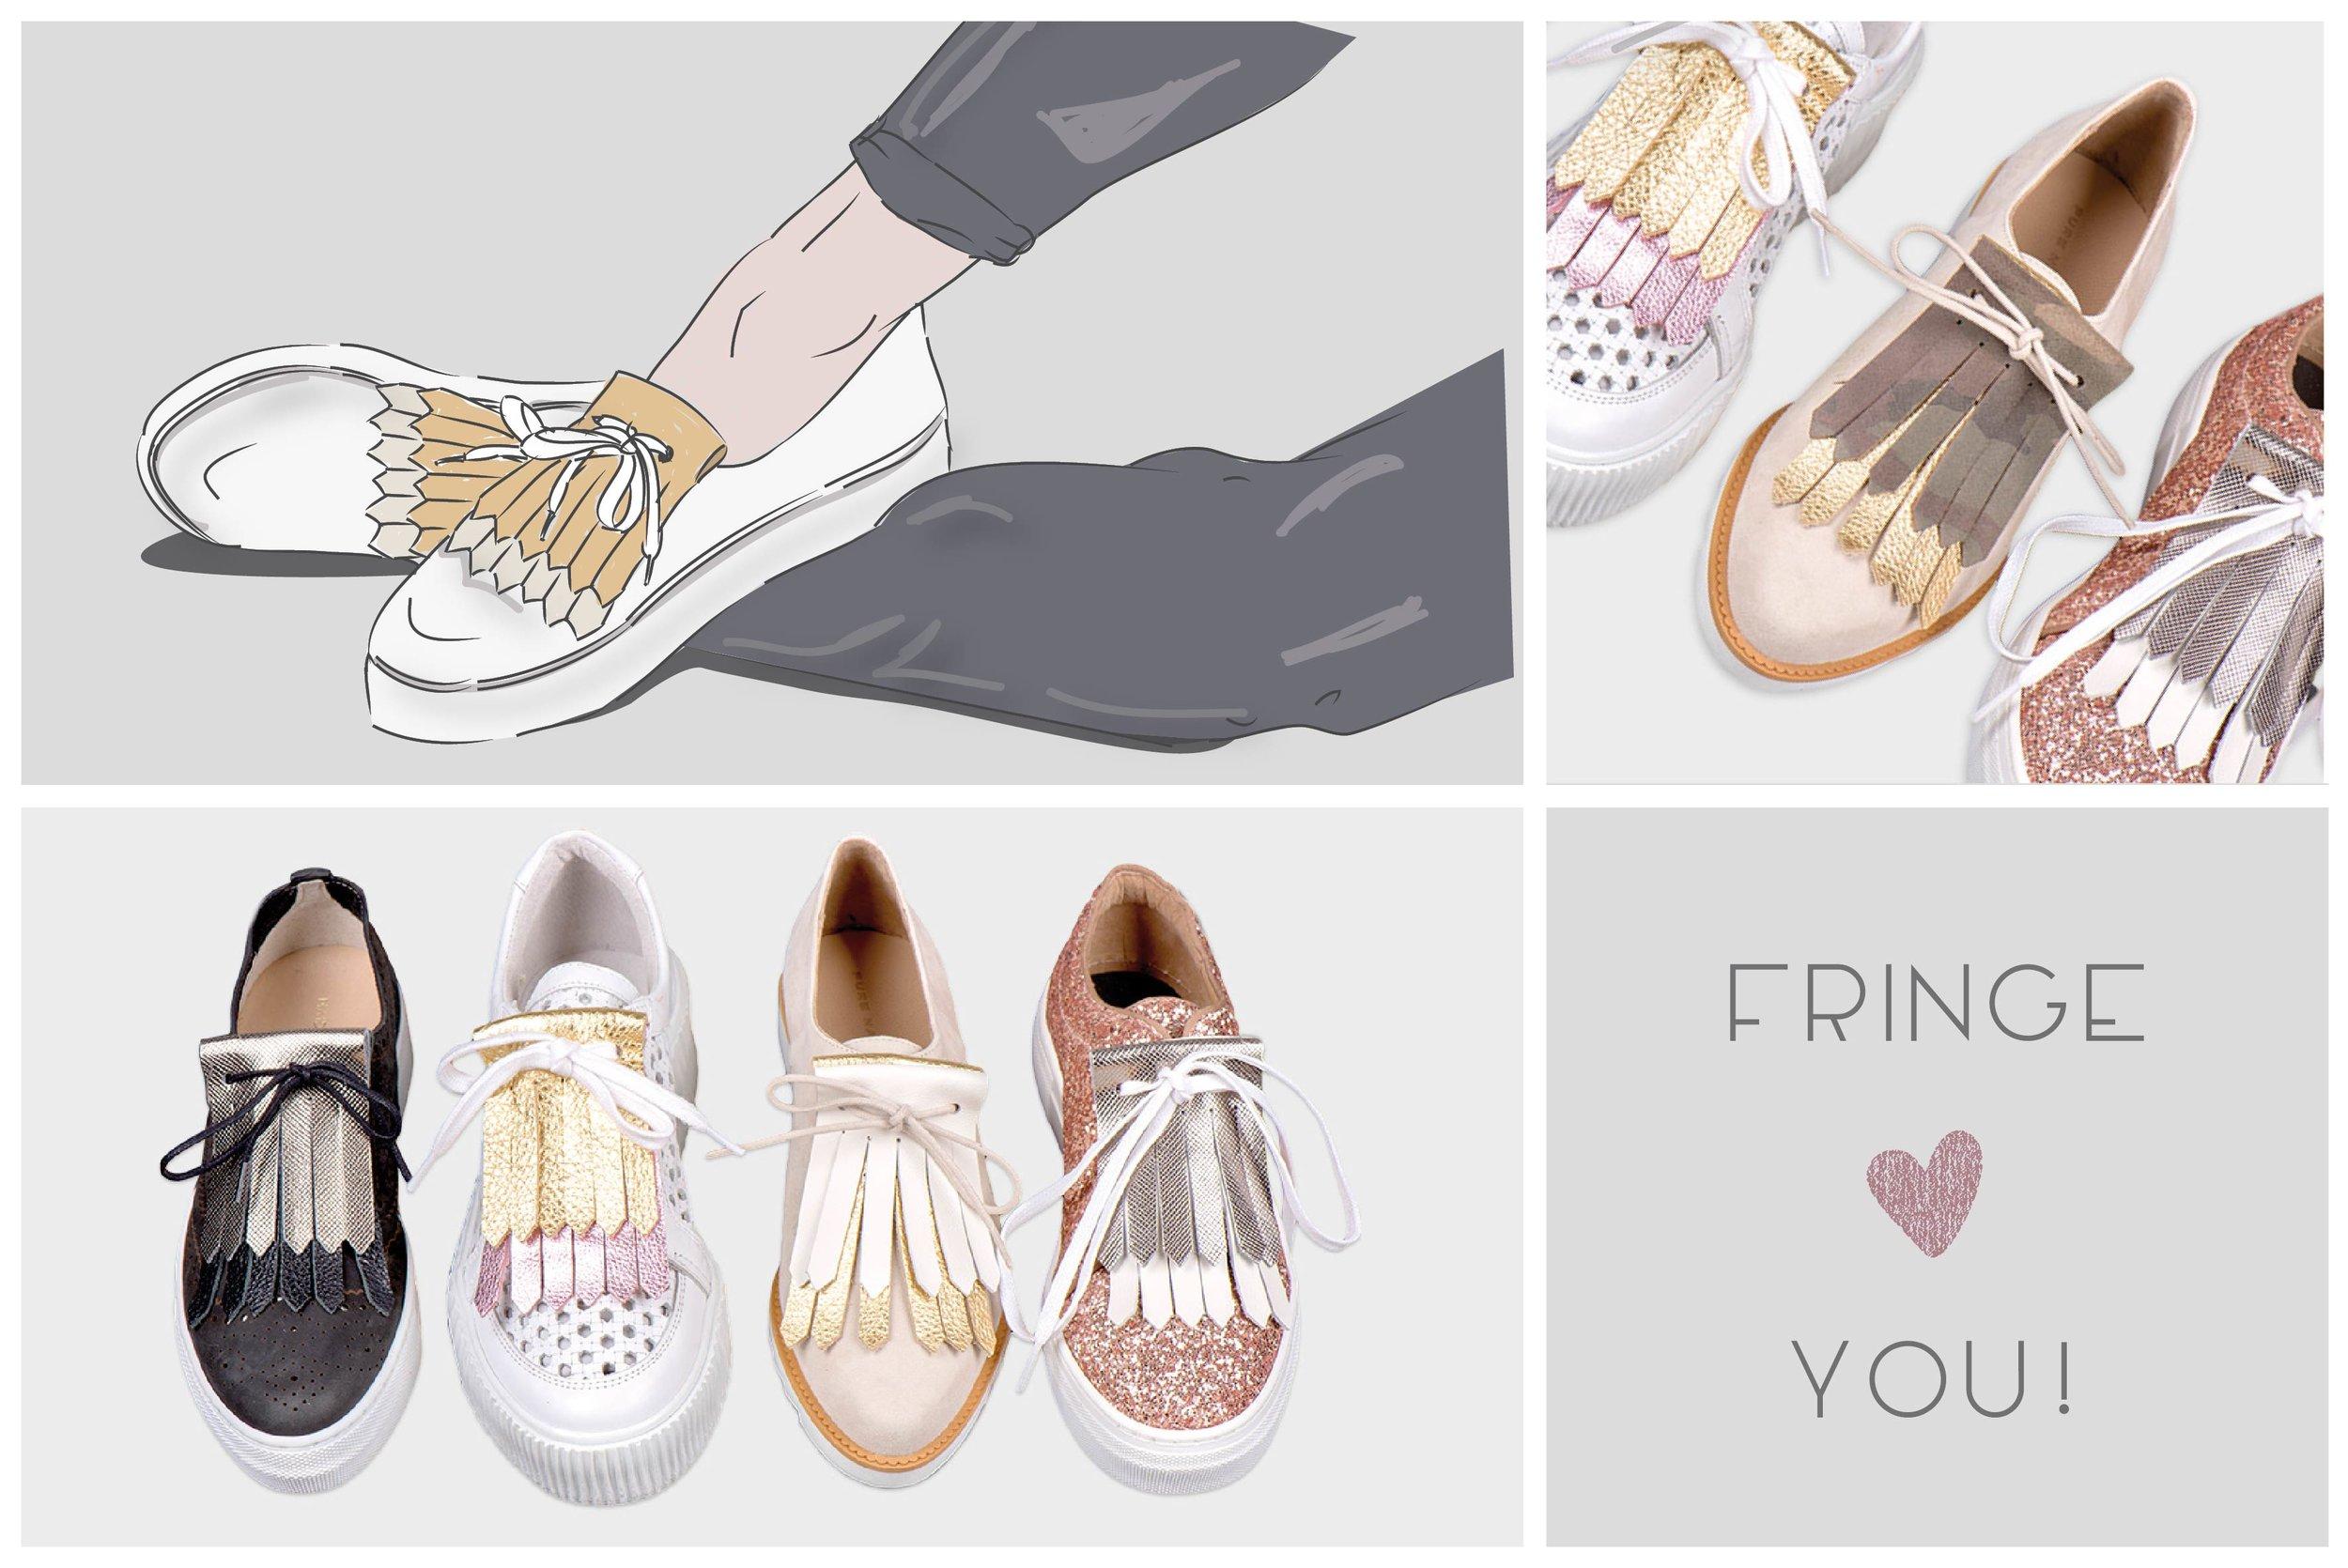 FRINGE_illustration-01.jpg